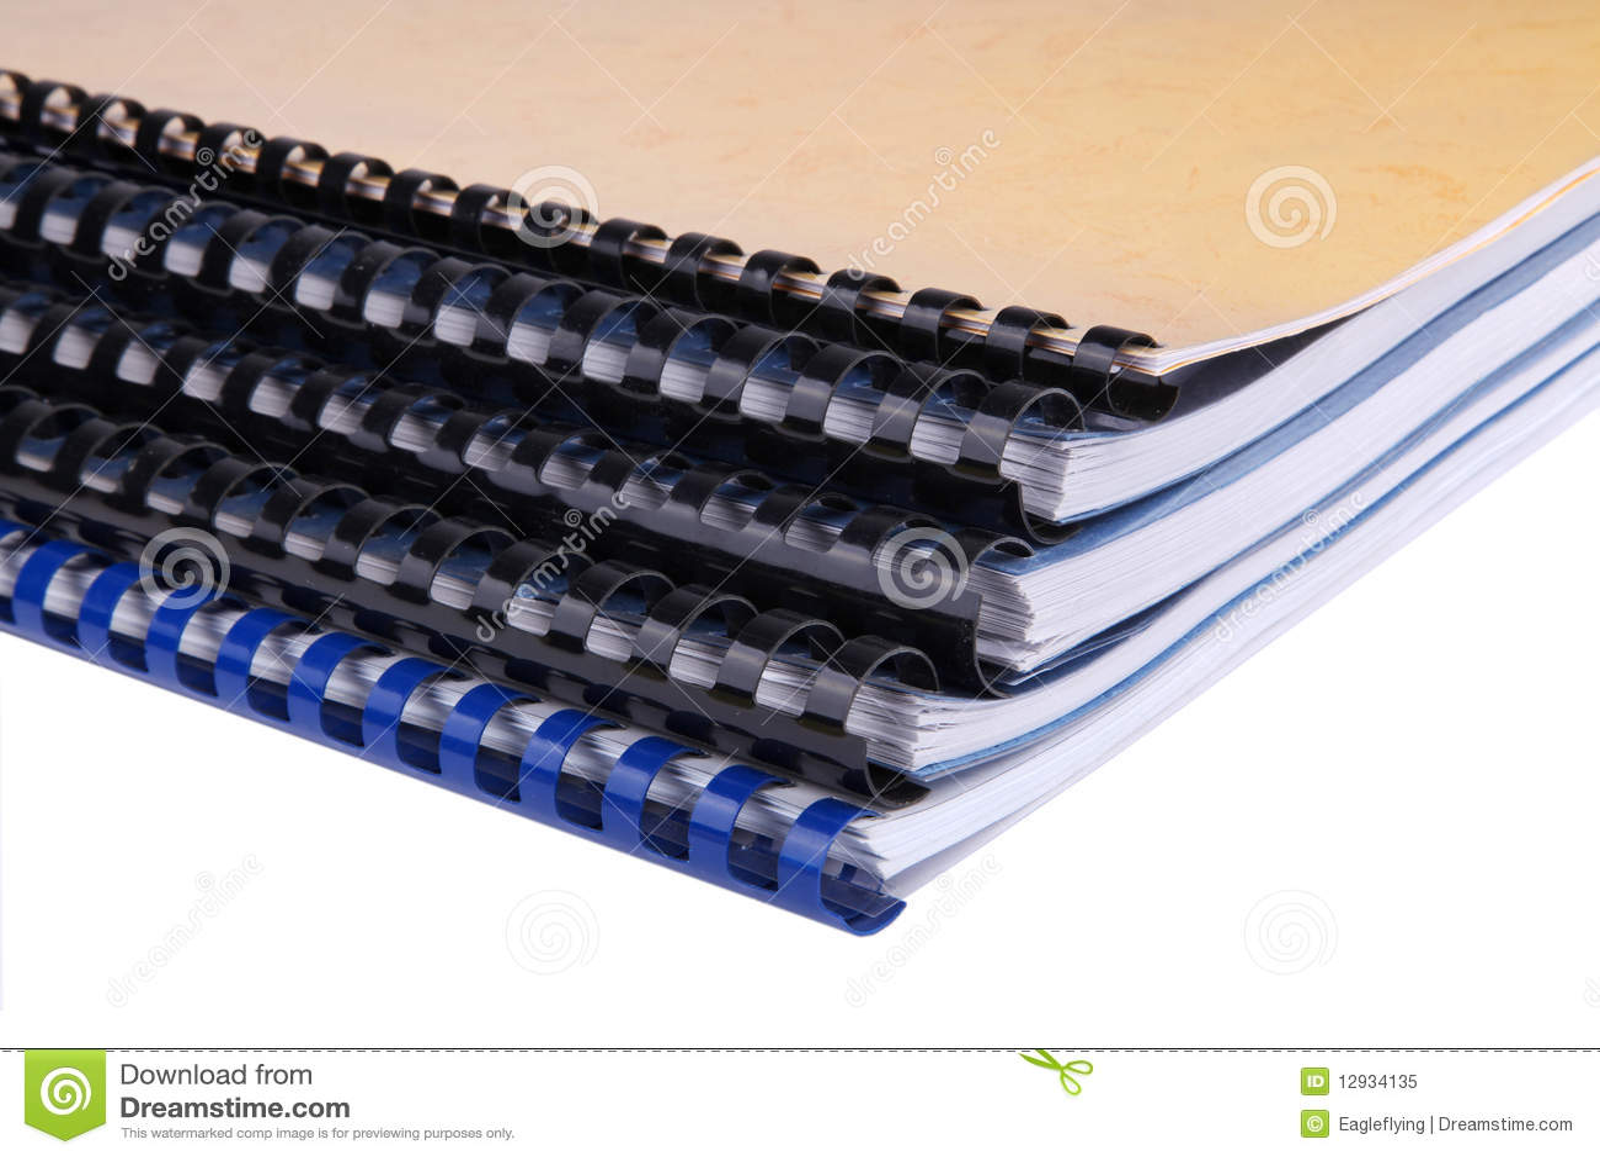 Practical Theory: Complete, Spiral-Bound Book Photo book spiral bound